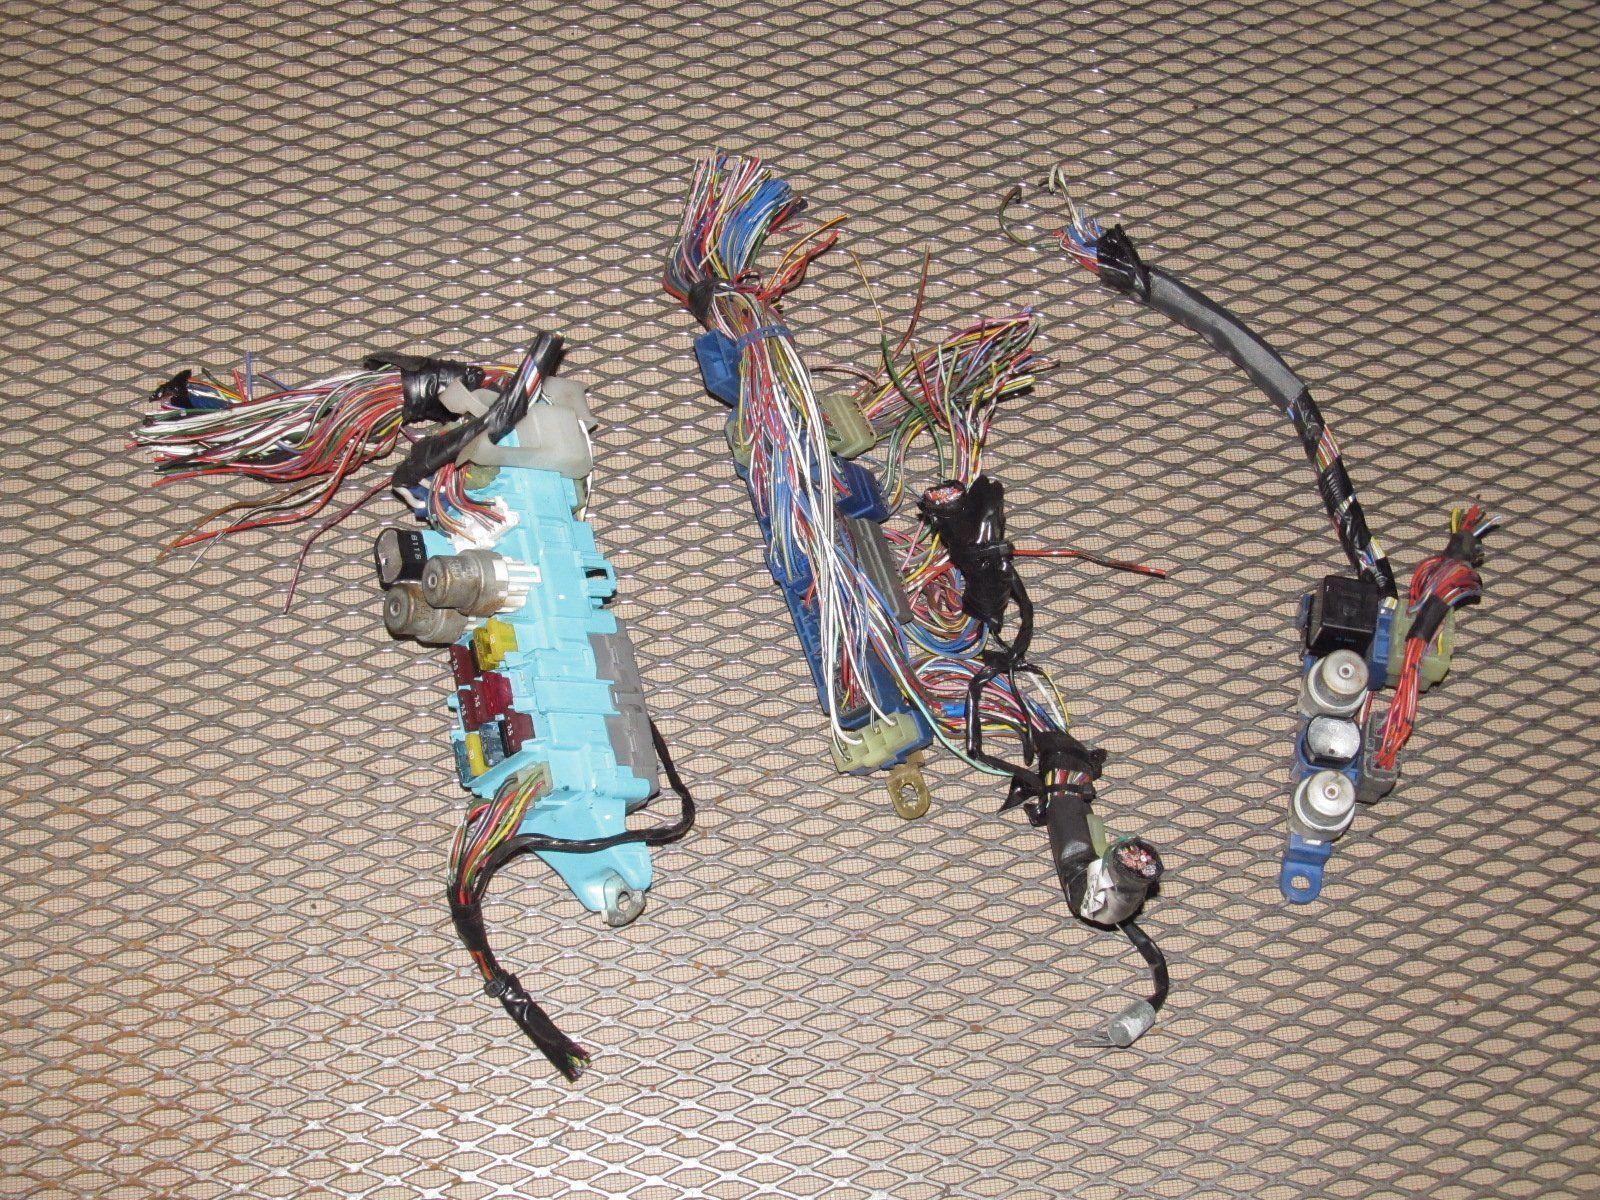 89 90 91 92 toyota supra oem dash interior fuse box harness [ 1600 x 1200 Pixel ]